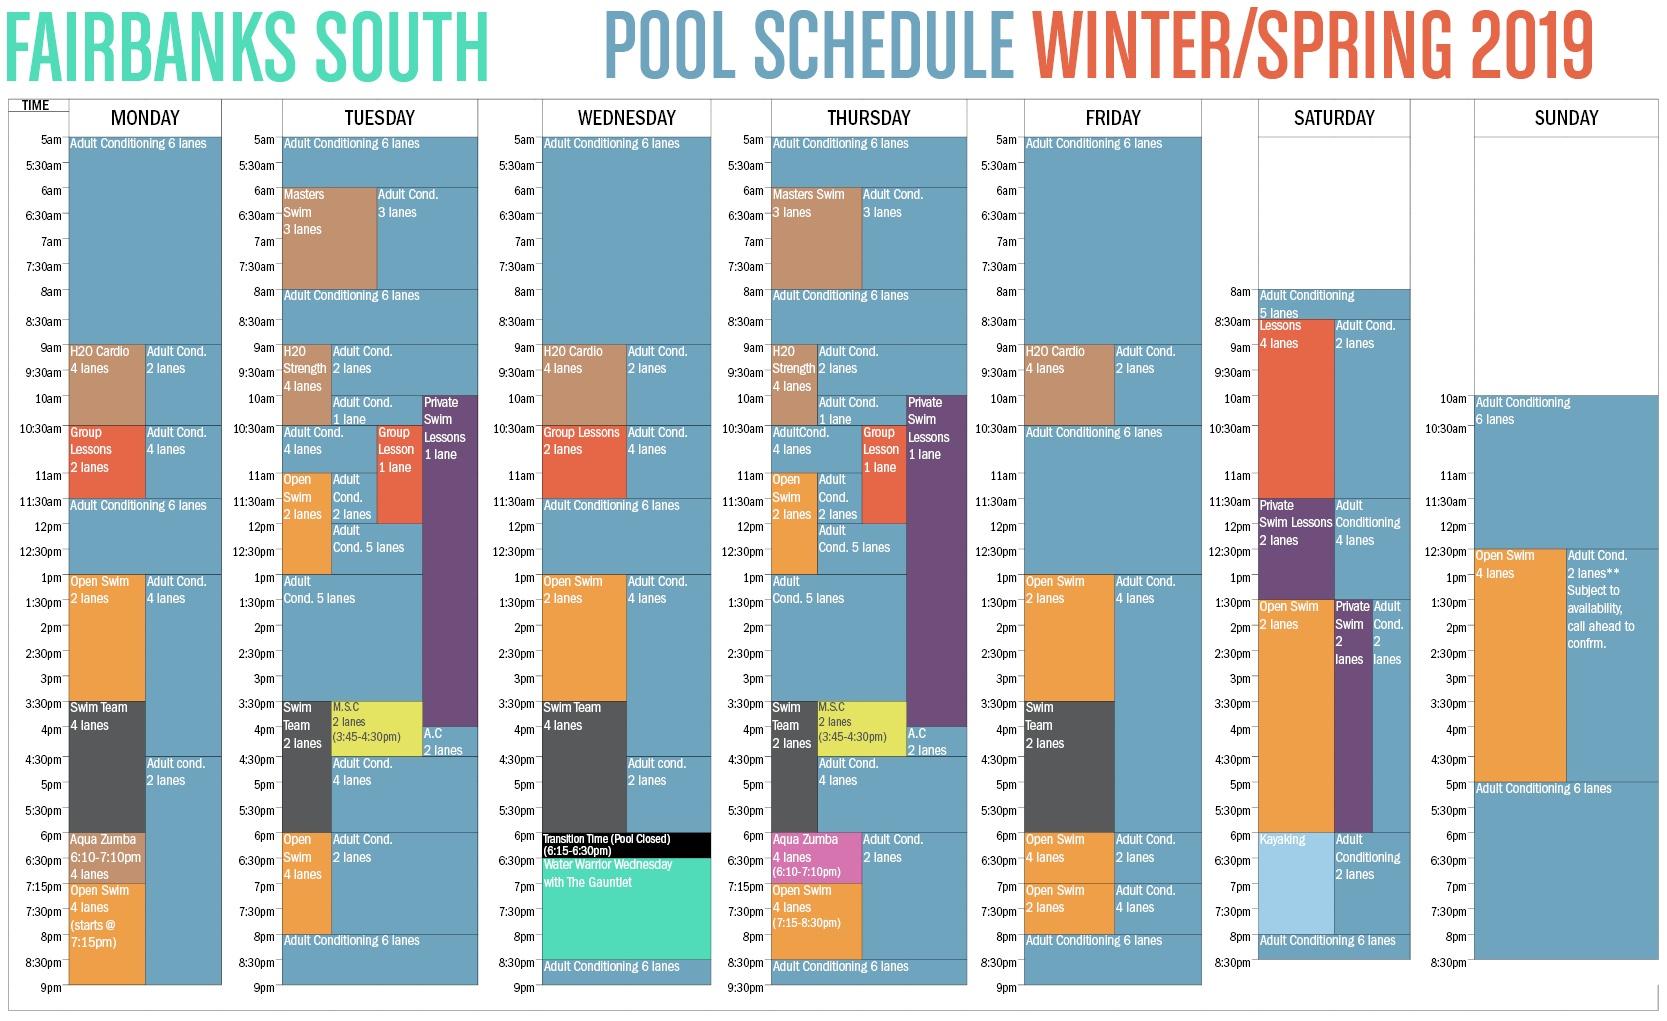 2018 Fall/Winter Fairbanks Pool Schedule